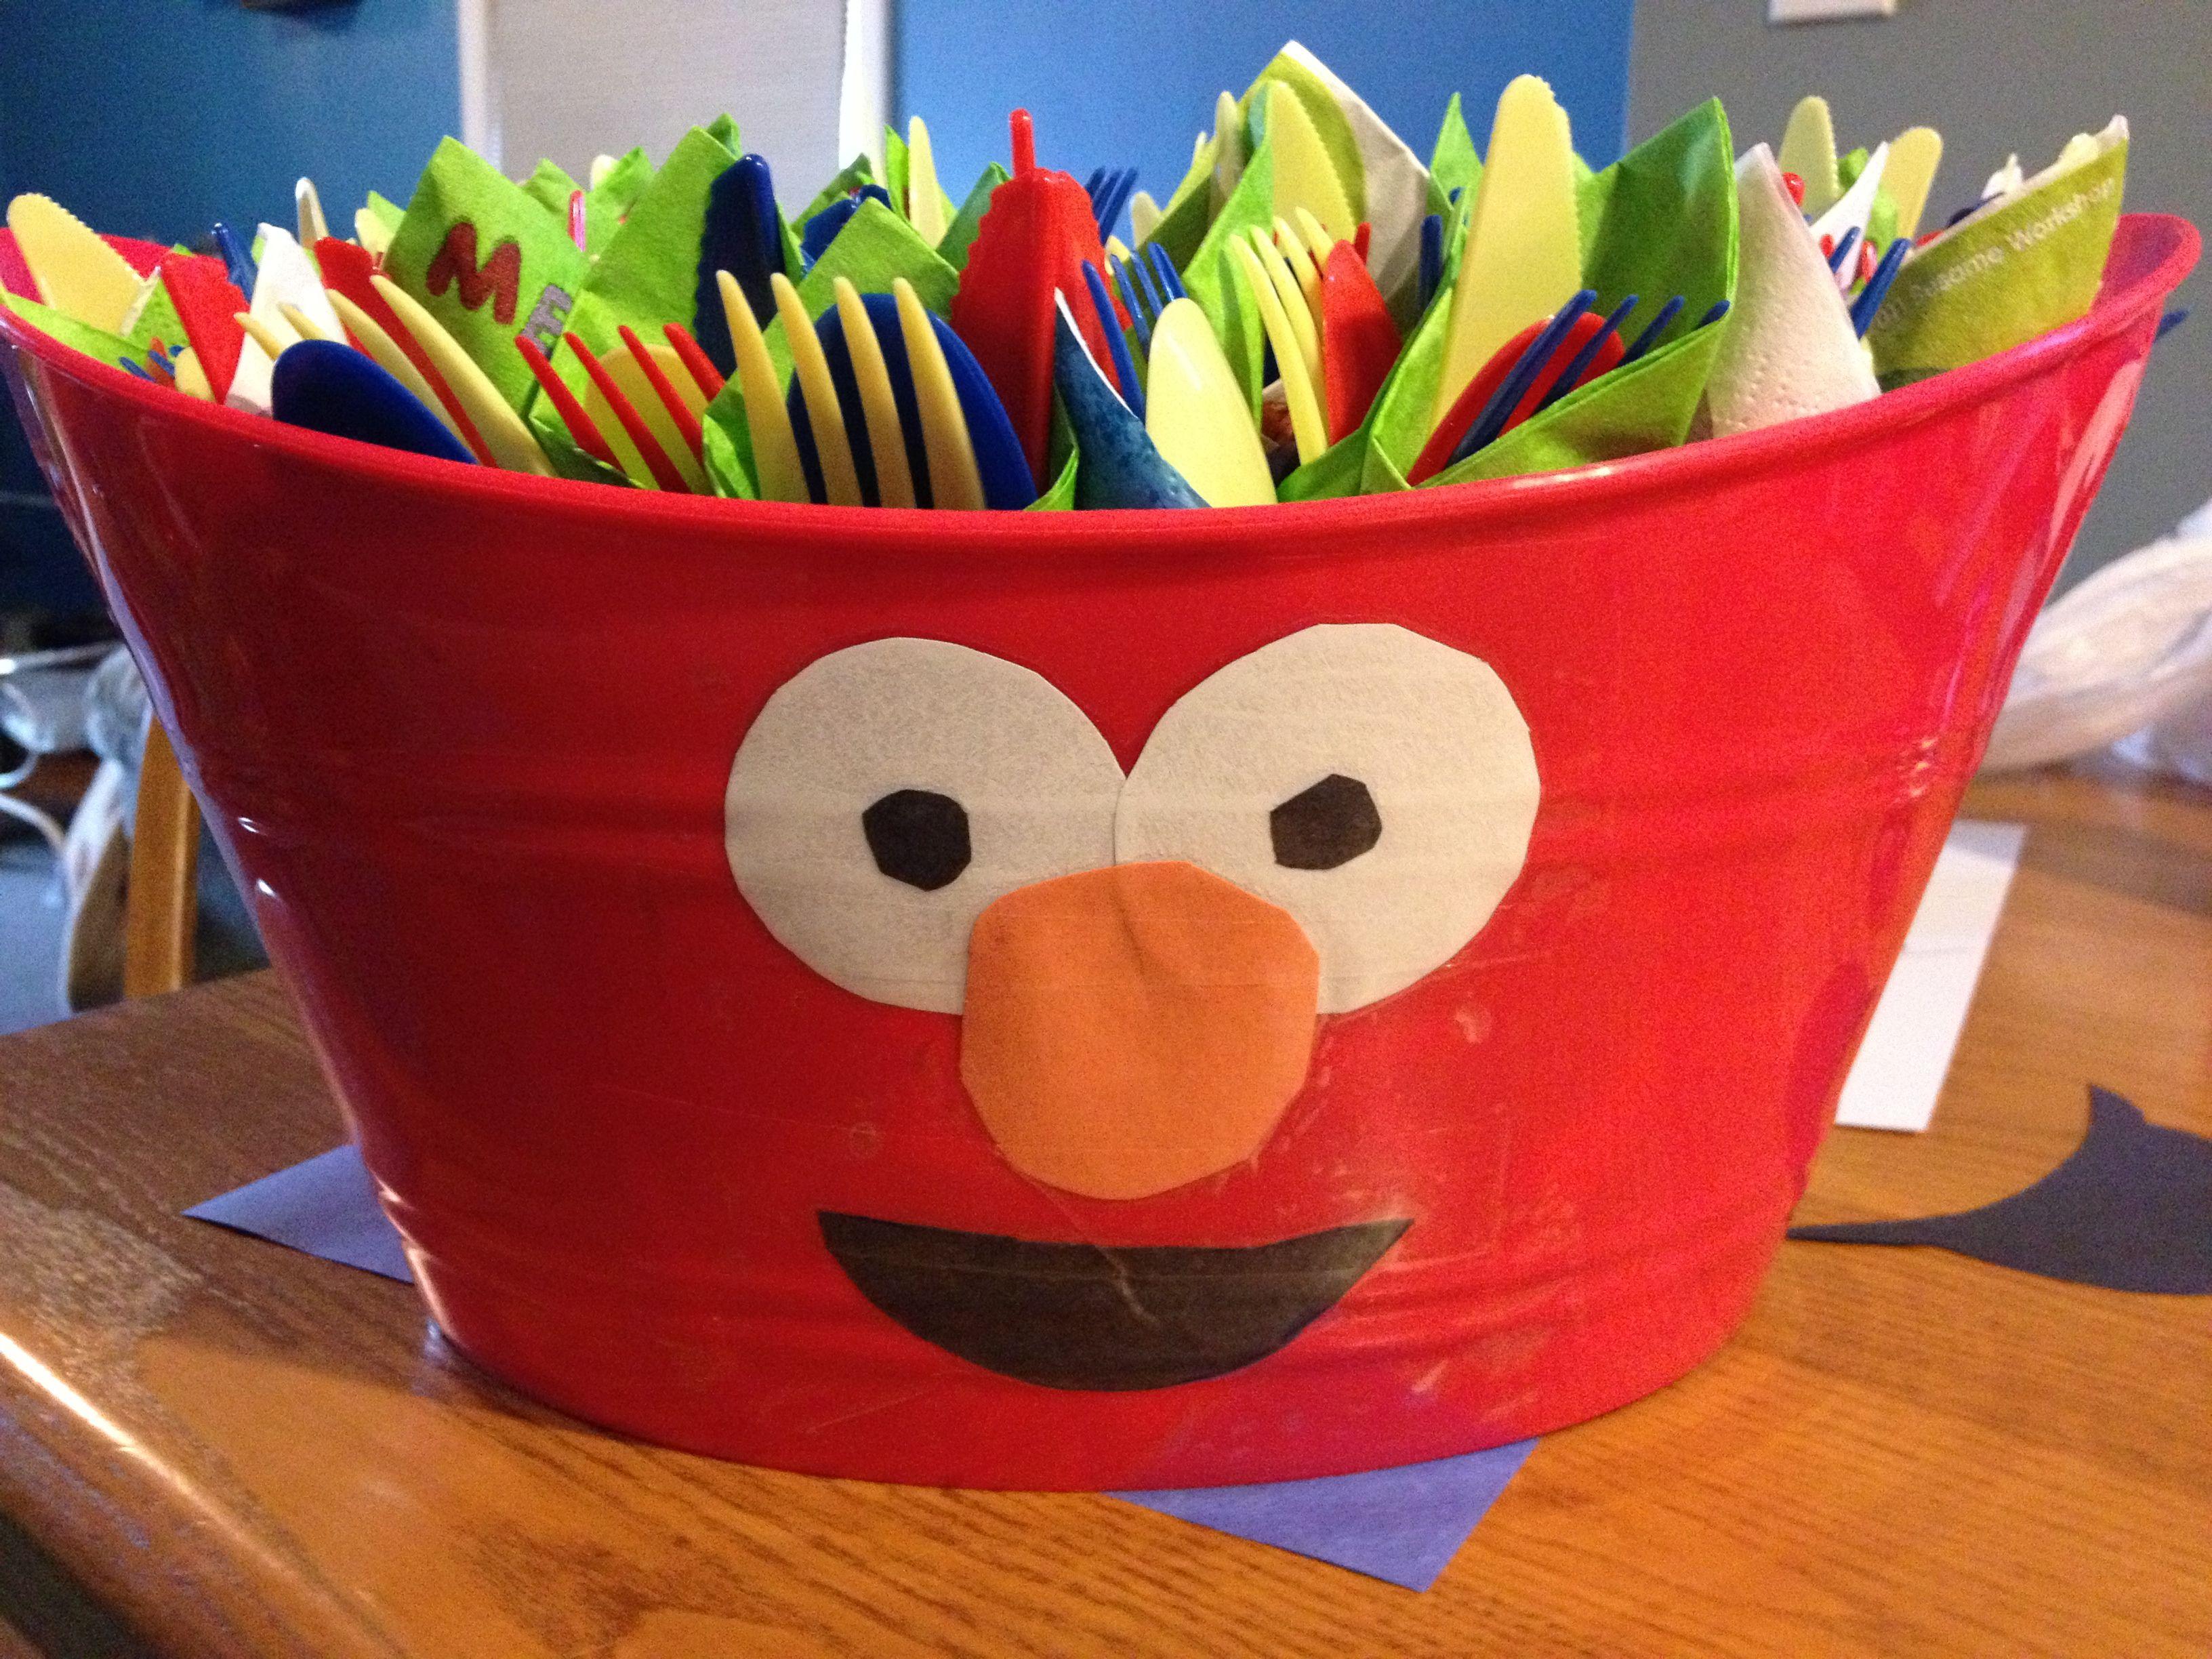 DIY Elmo bowls from the dollar tree for Sesame Street birthday – Homemade Elmo Birthday Invitations